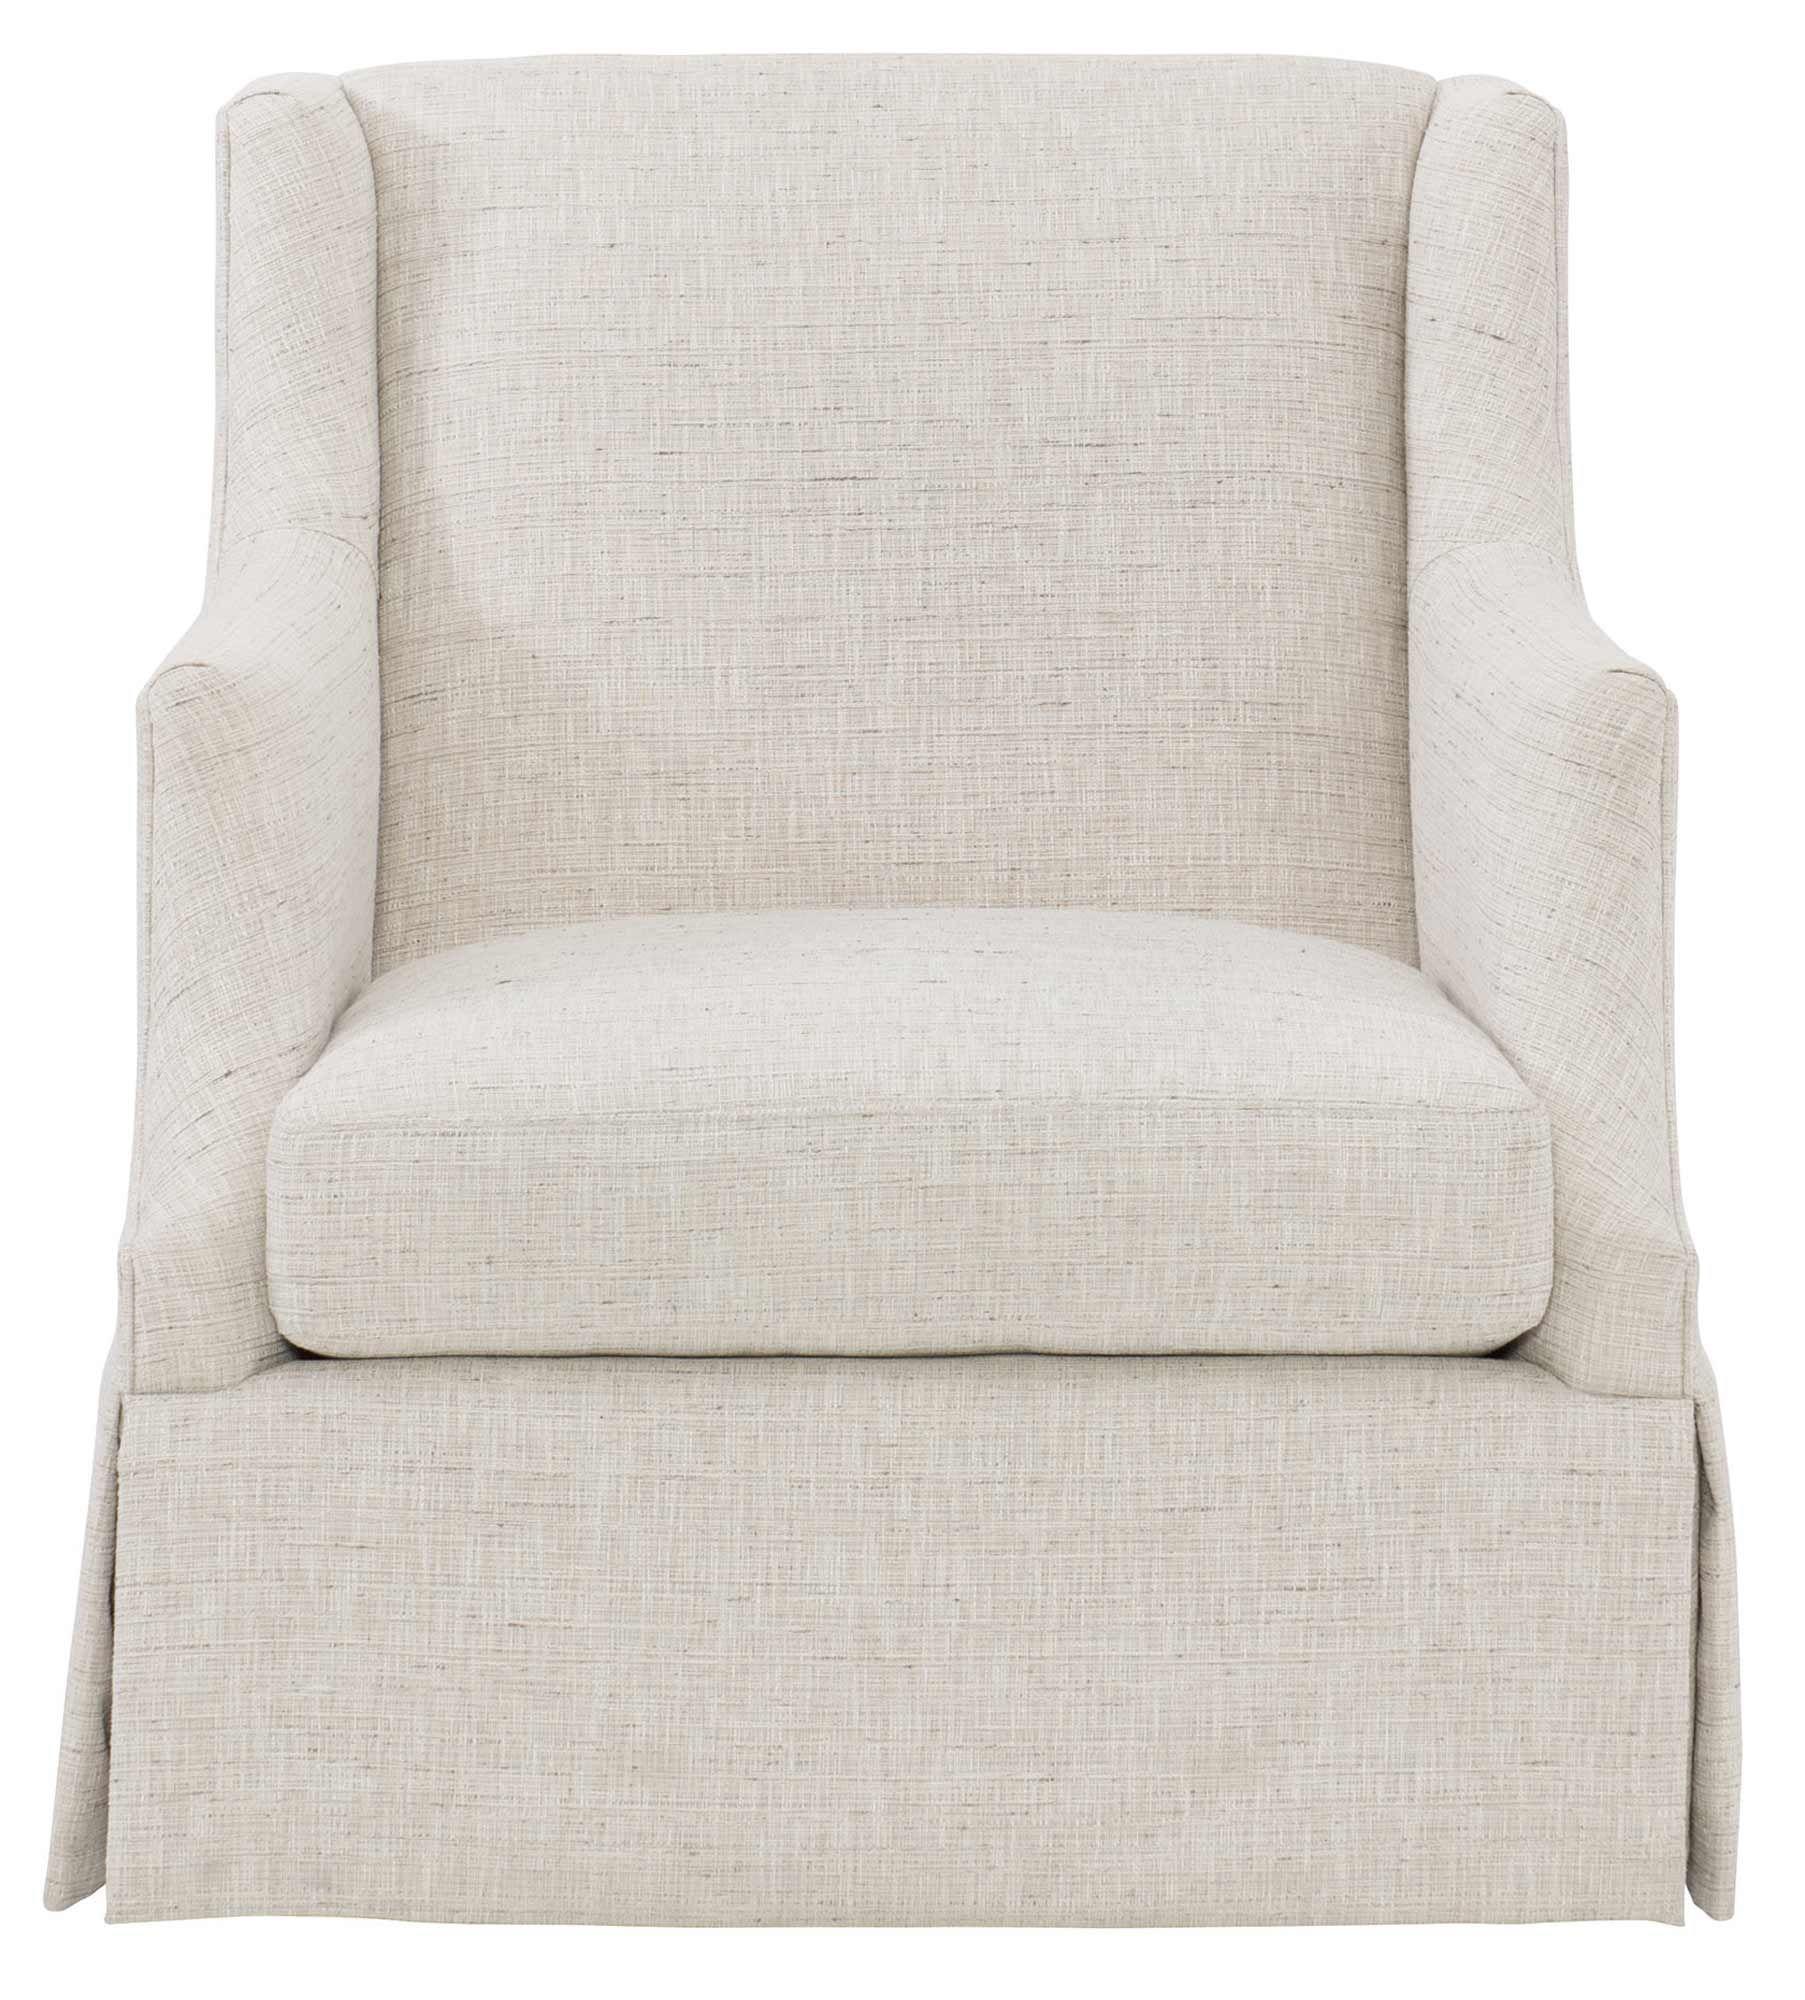 Brilliant Bernhardt Swivel Chairs Pdpeps Interior Chair Design Pdpepsorg